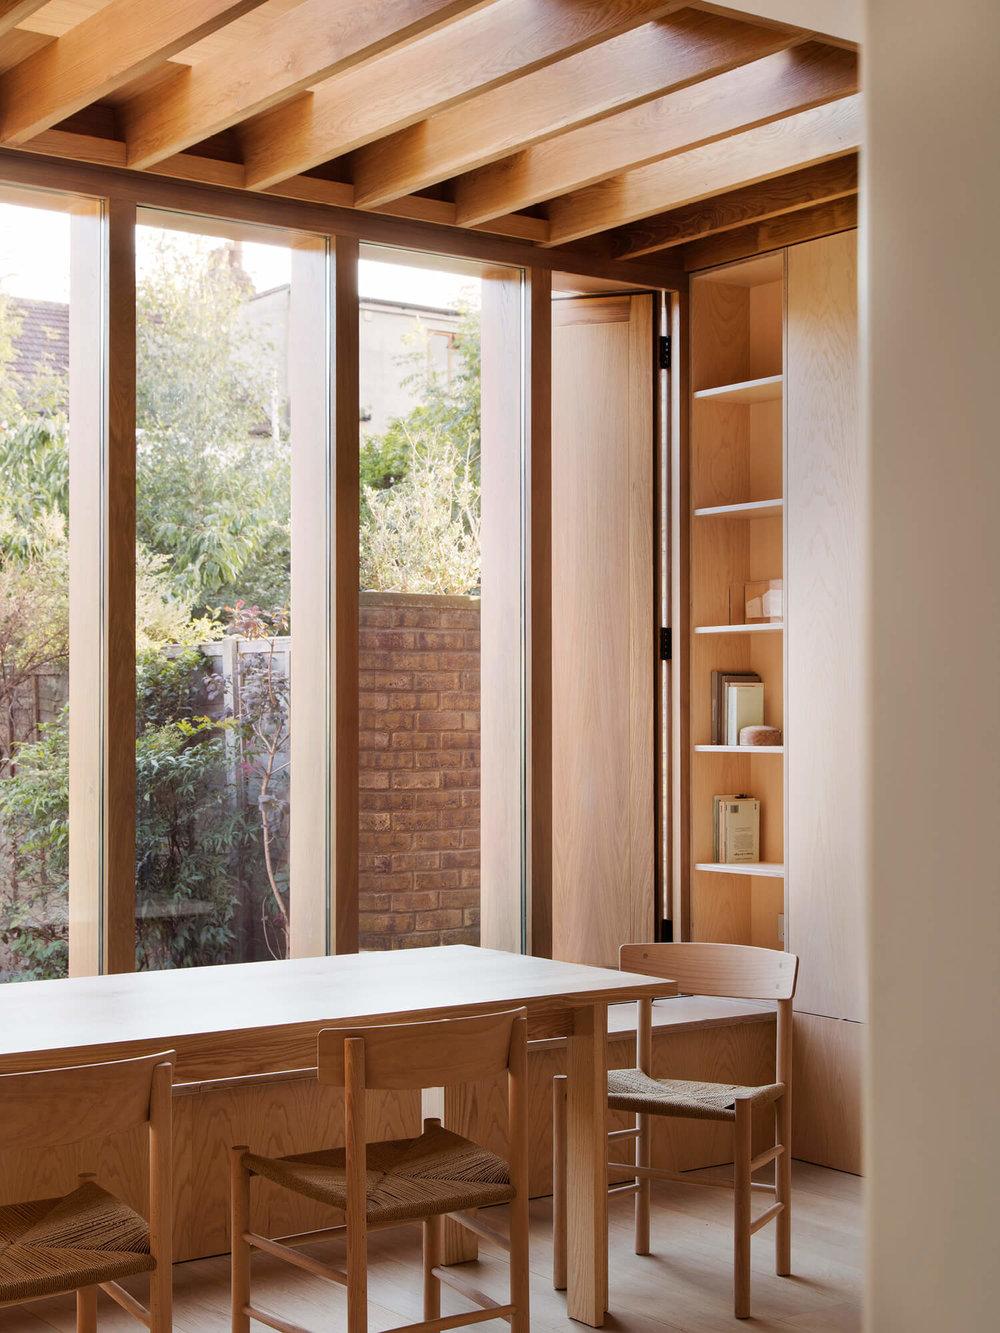 est-living-dewsbury-road-o-sullivan-architects-02.jpg